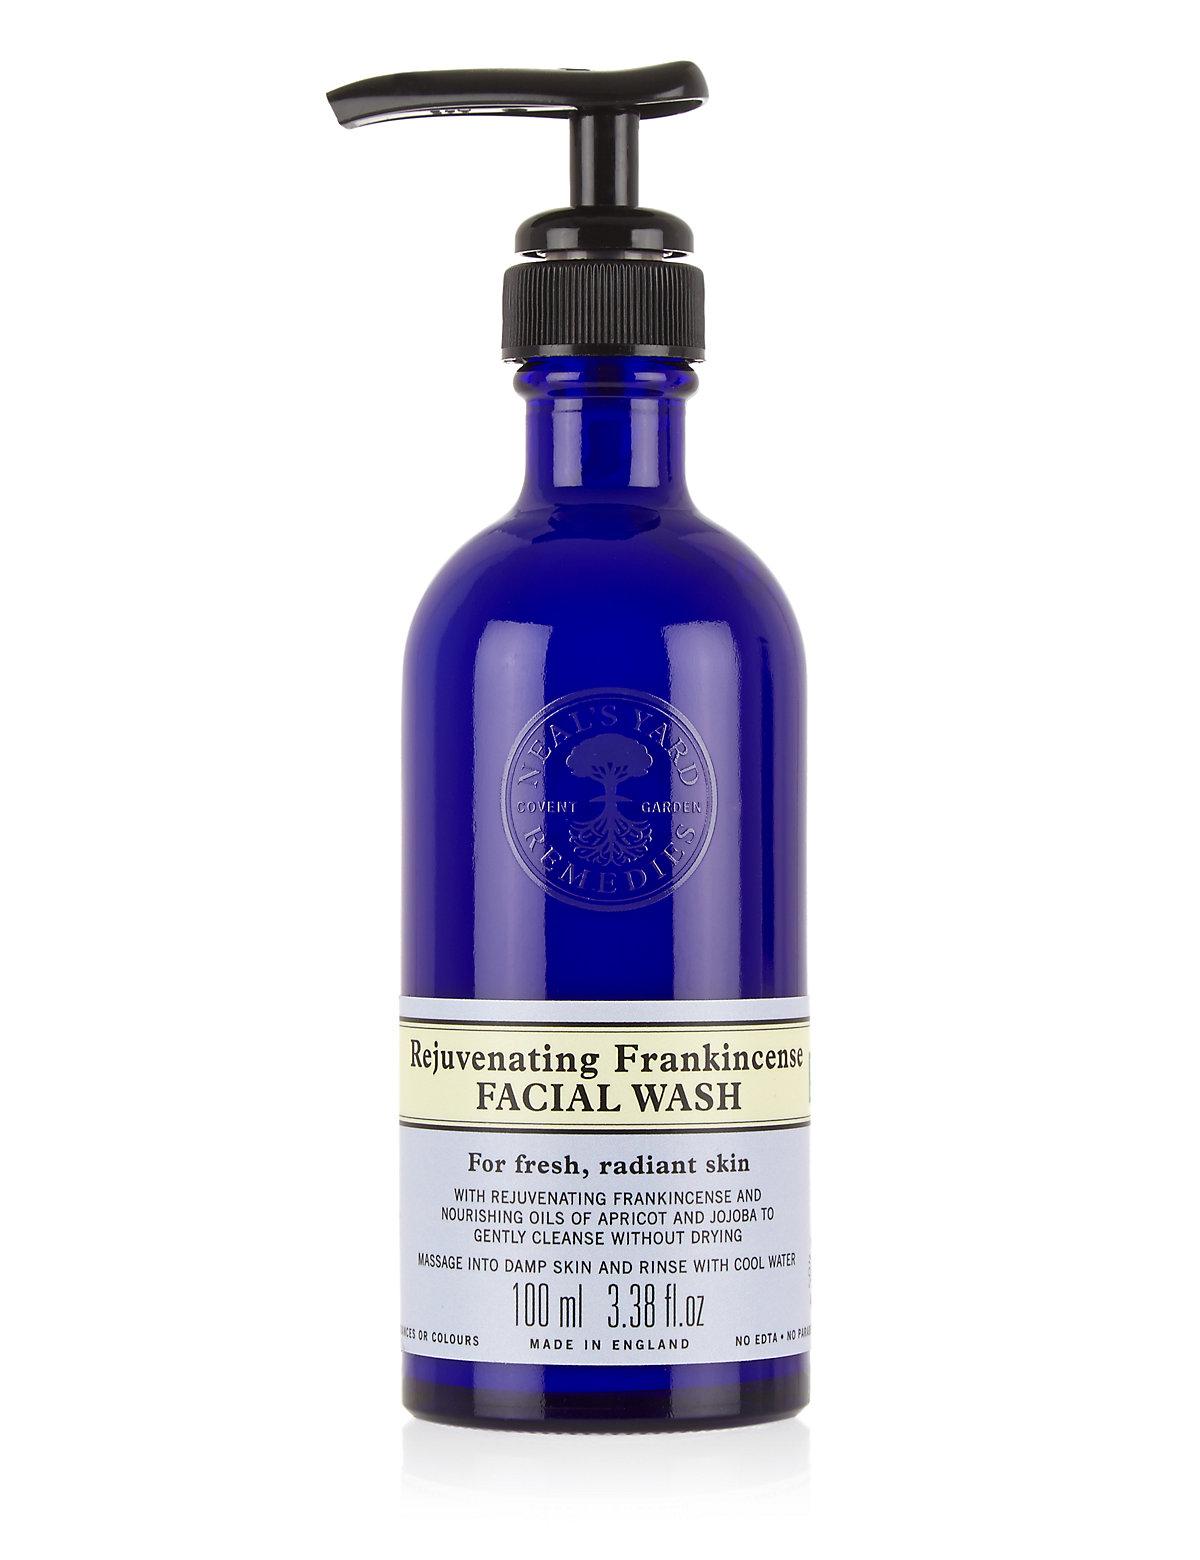 Neal's Yard Remedies Frankincense Face Wash 100ml